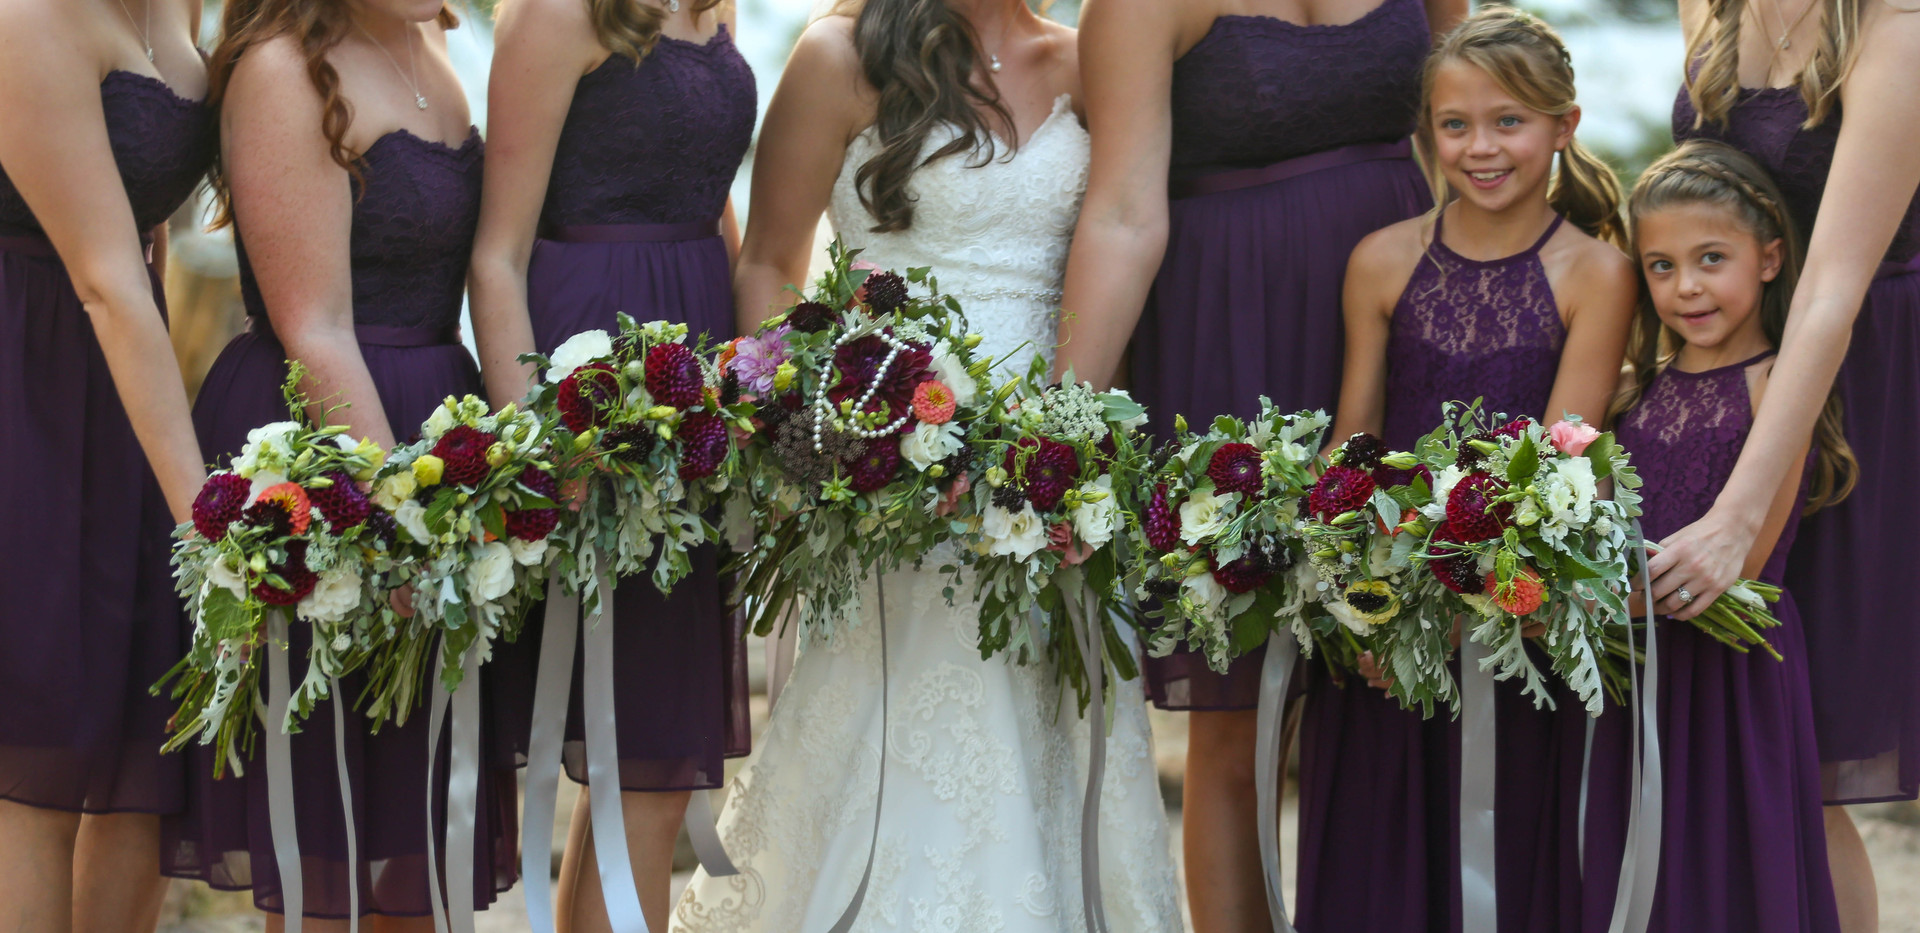 Kenna's Wedding, August 2018 Photo Credit: Preston Slaughter Photography